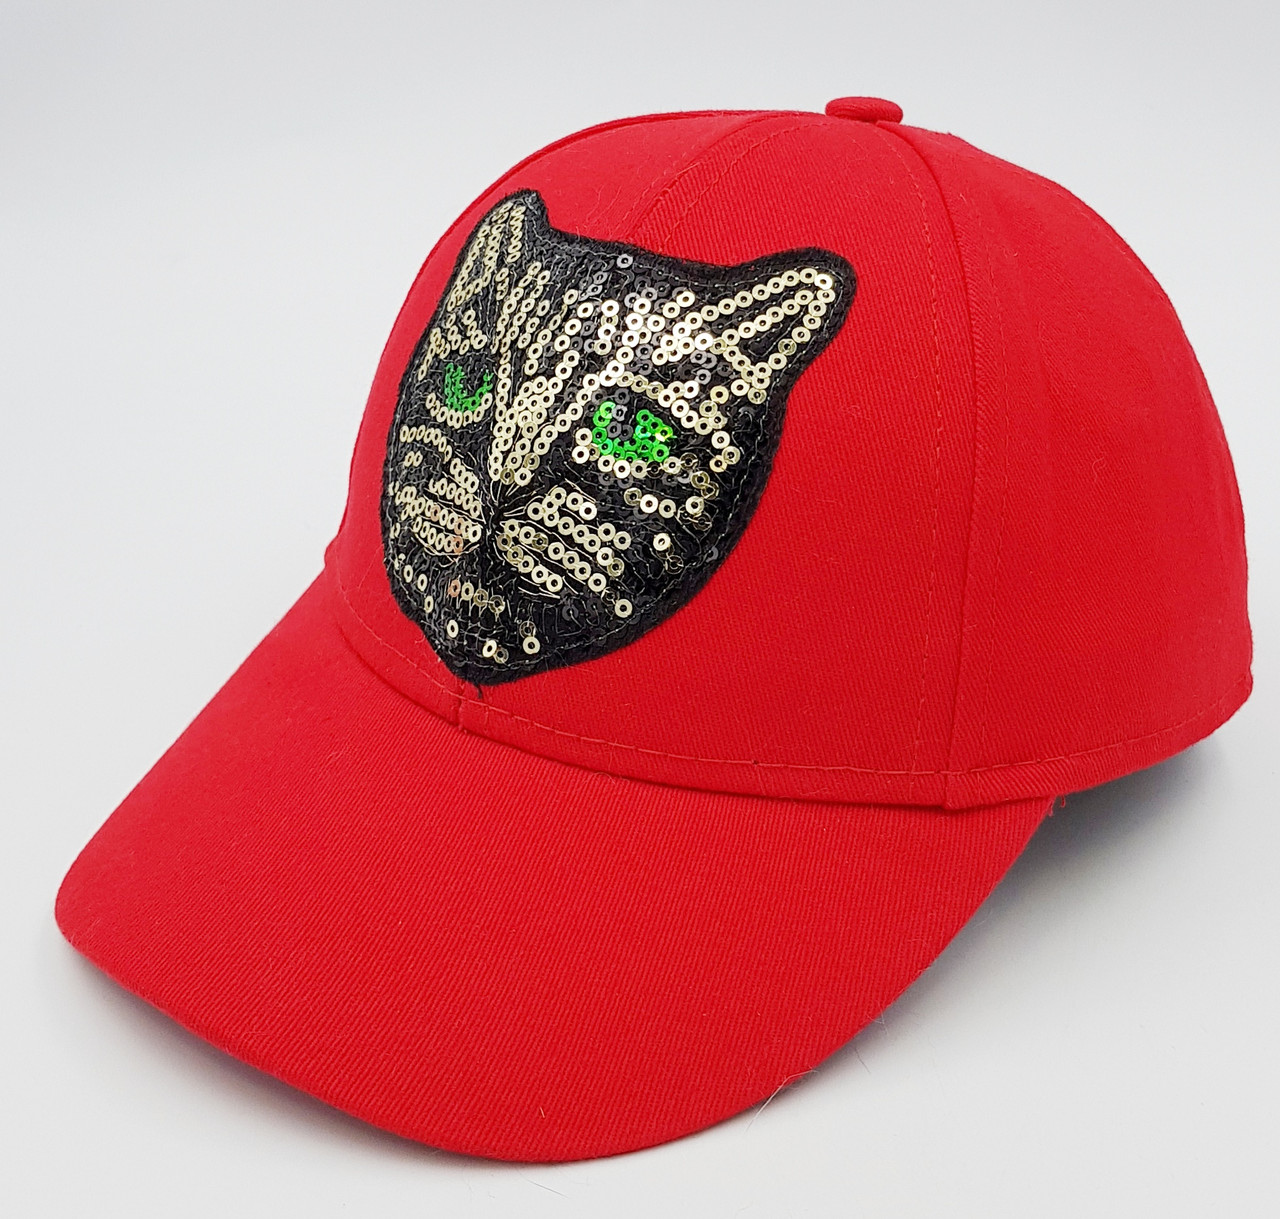 Женская бейсболка Klaus Кошка  Коттон Красный One size -Демисезон (036-К)